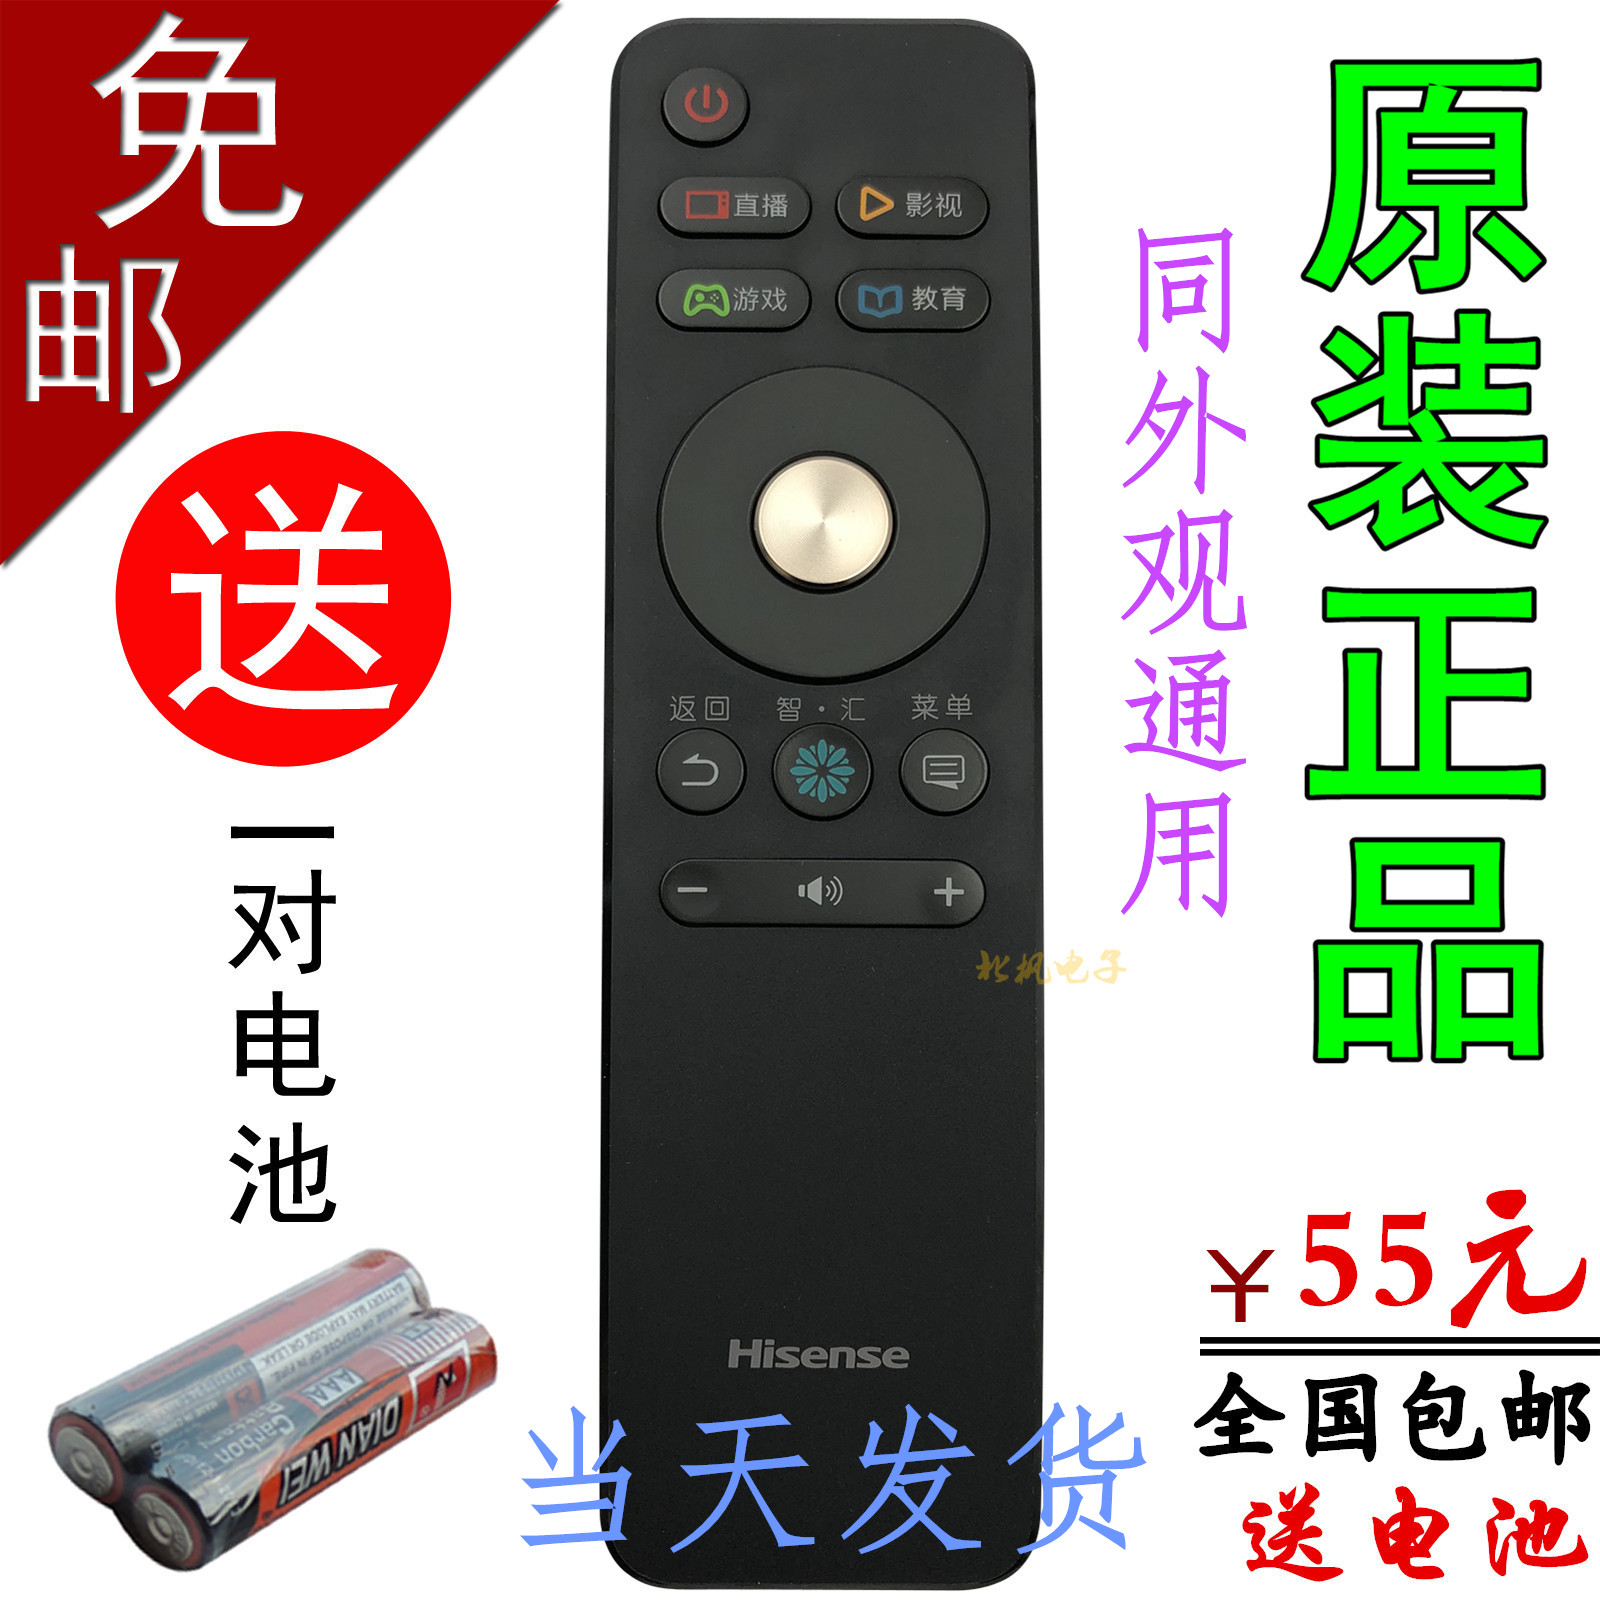 cheap Purchase china agnet Original Hisense TV remote control CN3A68